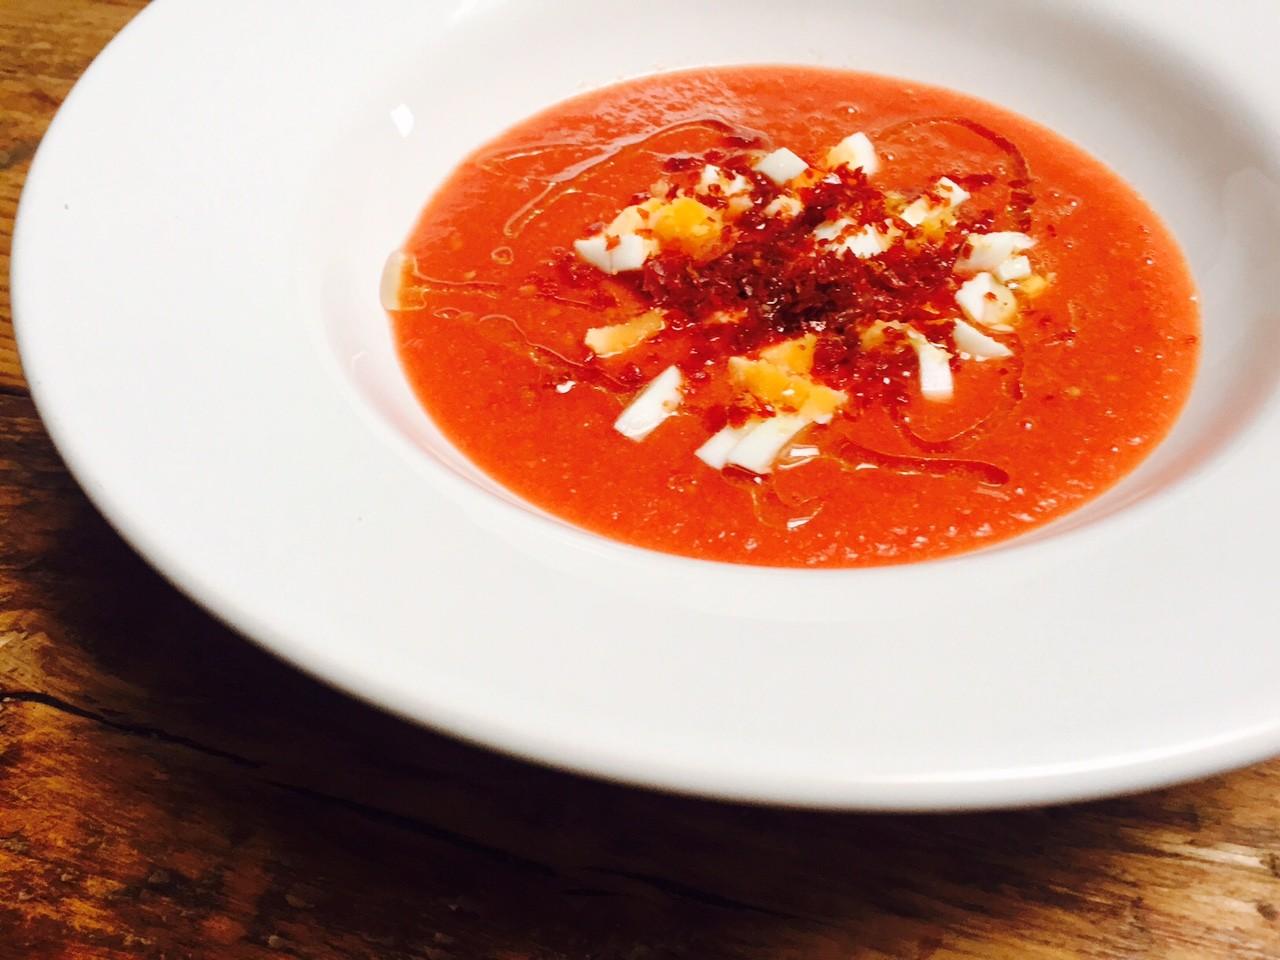 salmorejo Spaanse koude tomatensoep recept van foodblog Foodinista